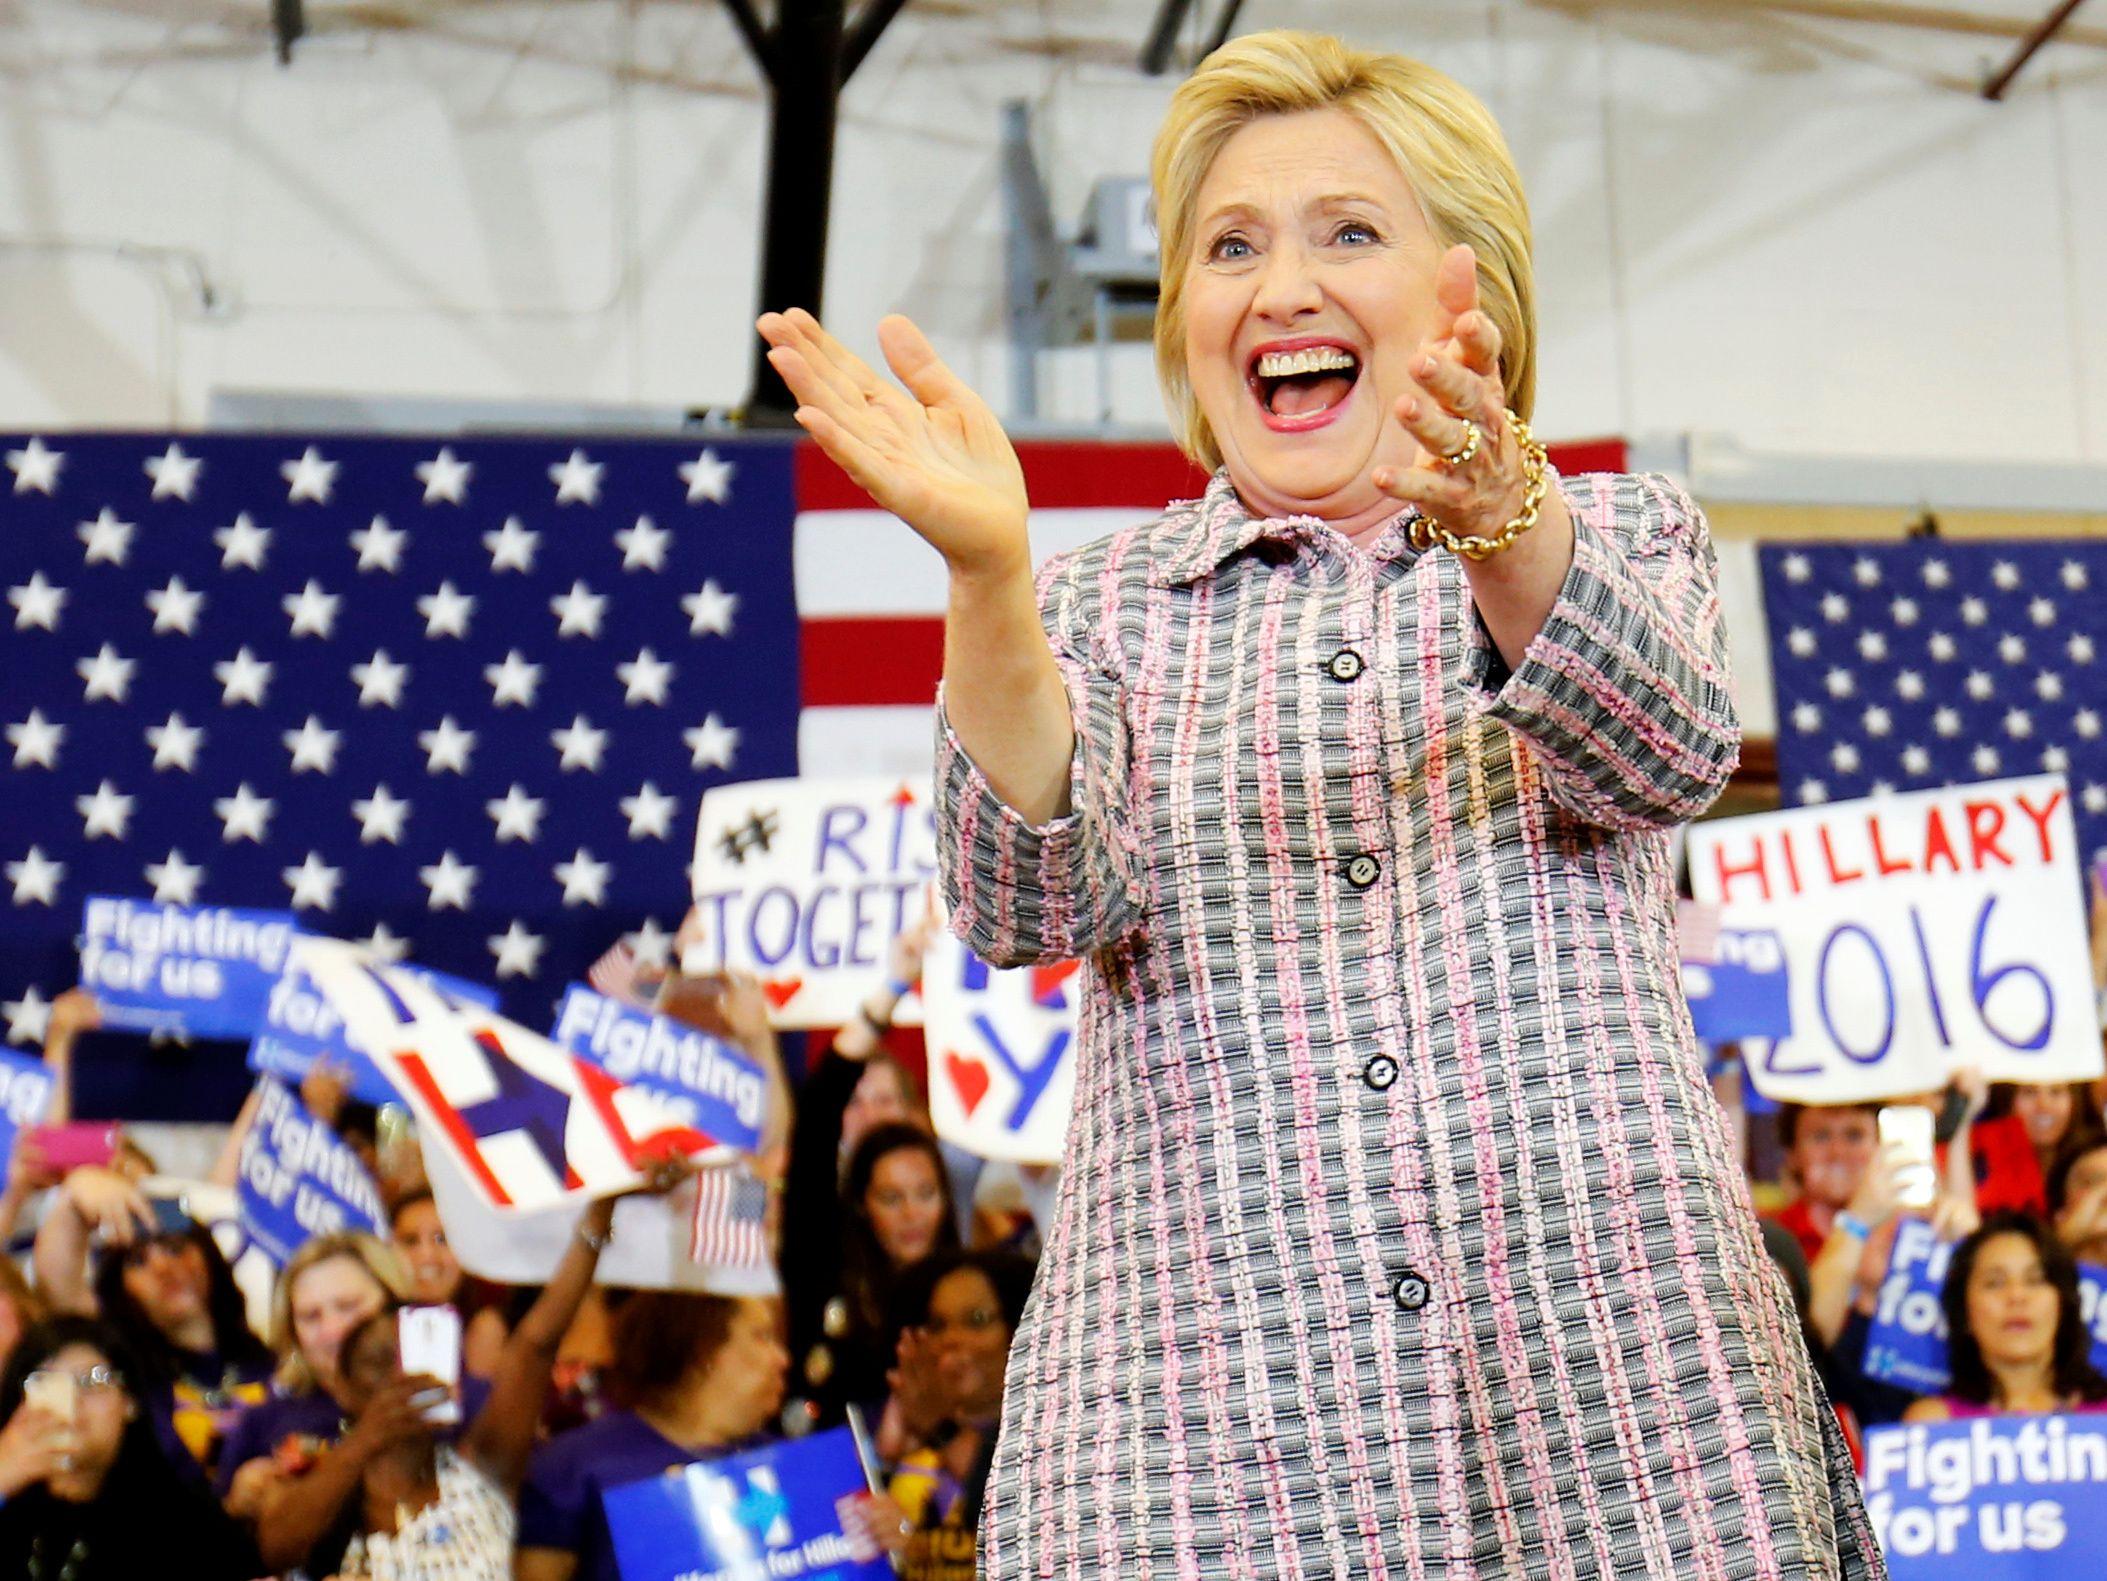 06_06_Hillary_Clinton_01